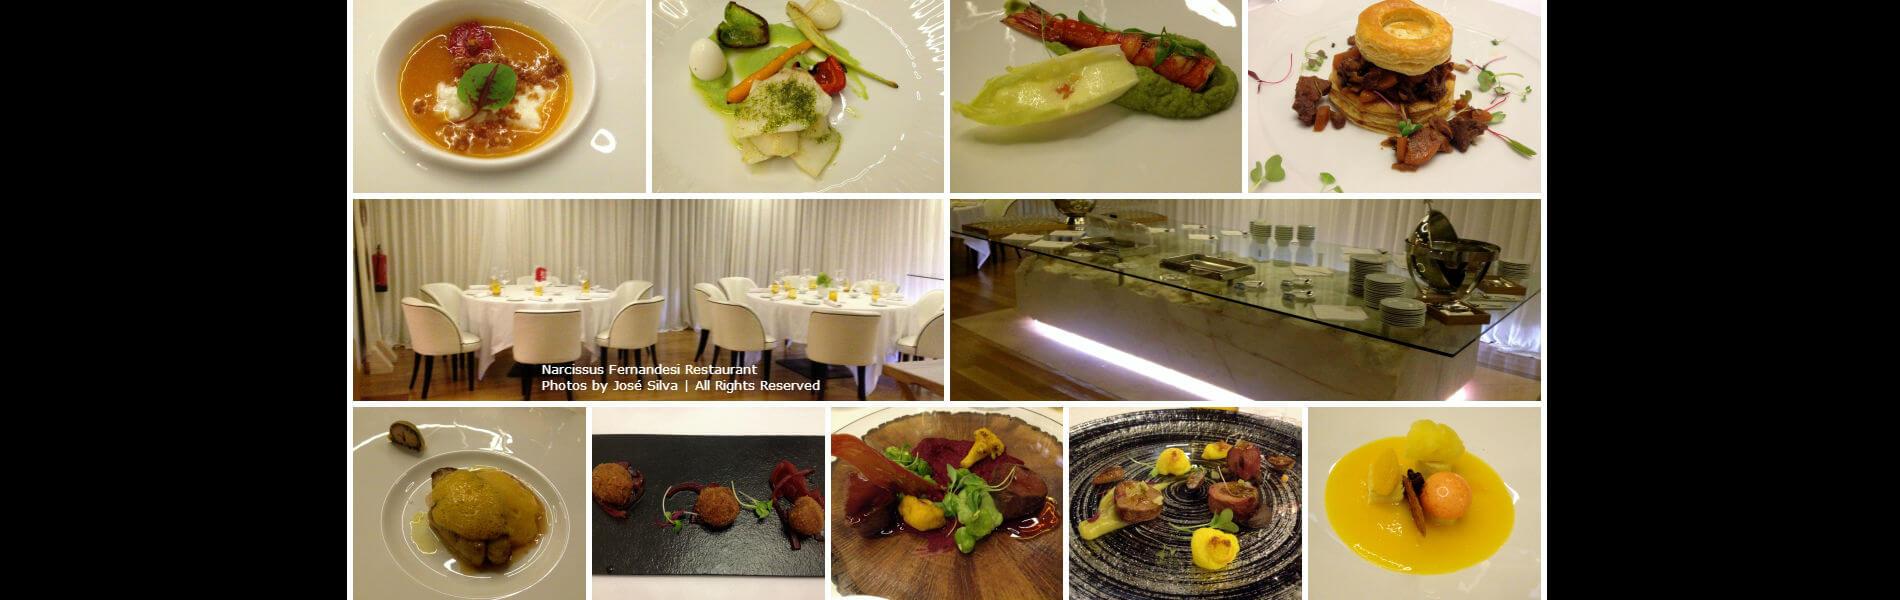 Blend-All-About-Wine-Narcissus Fernandesi Restaurant-Slider